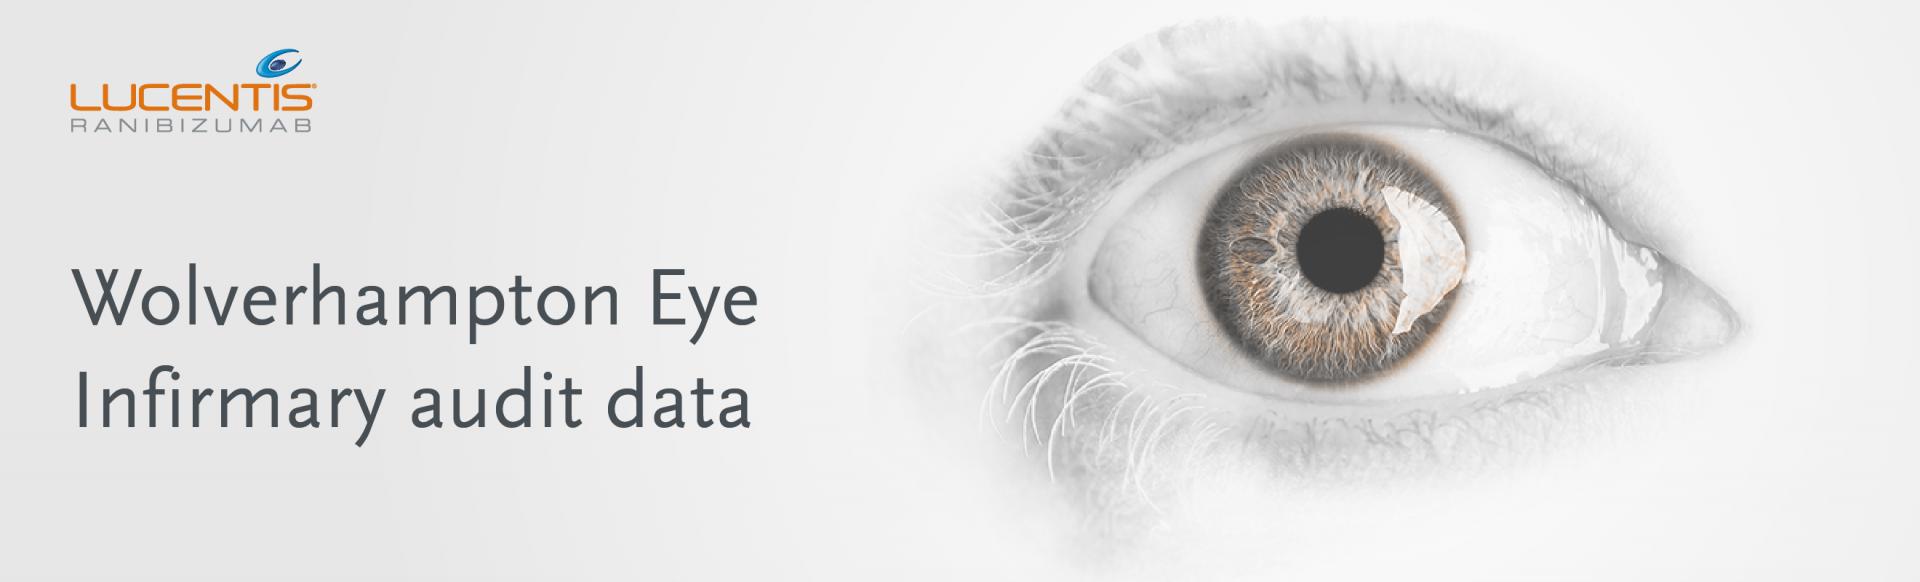 Top banner. Wolverhampton Eye Infirmary audit data